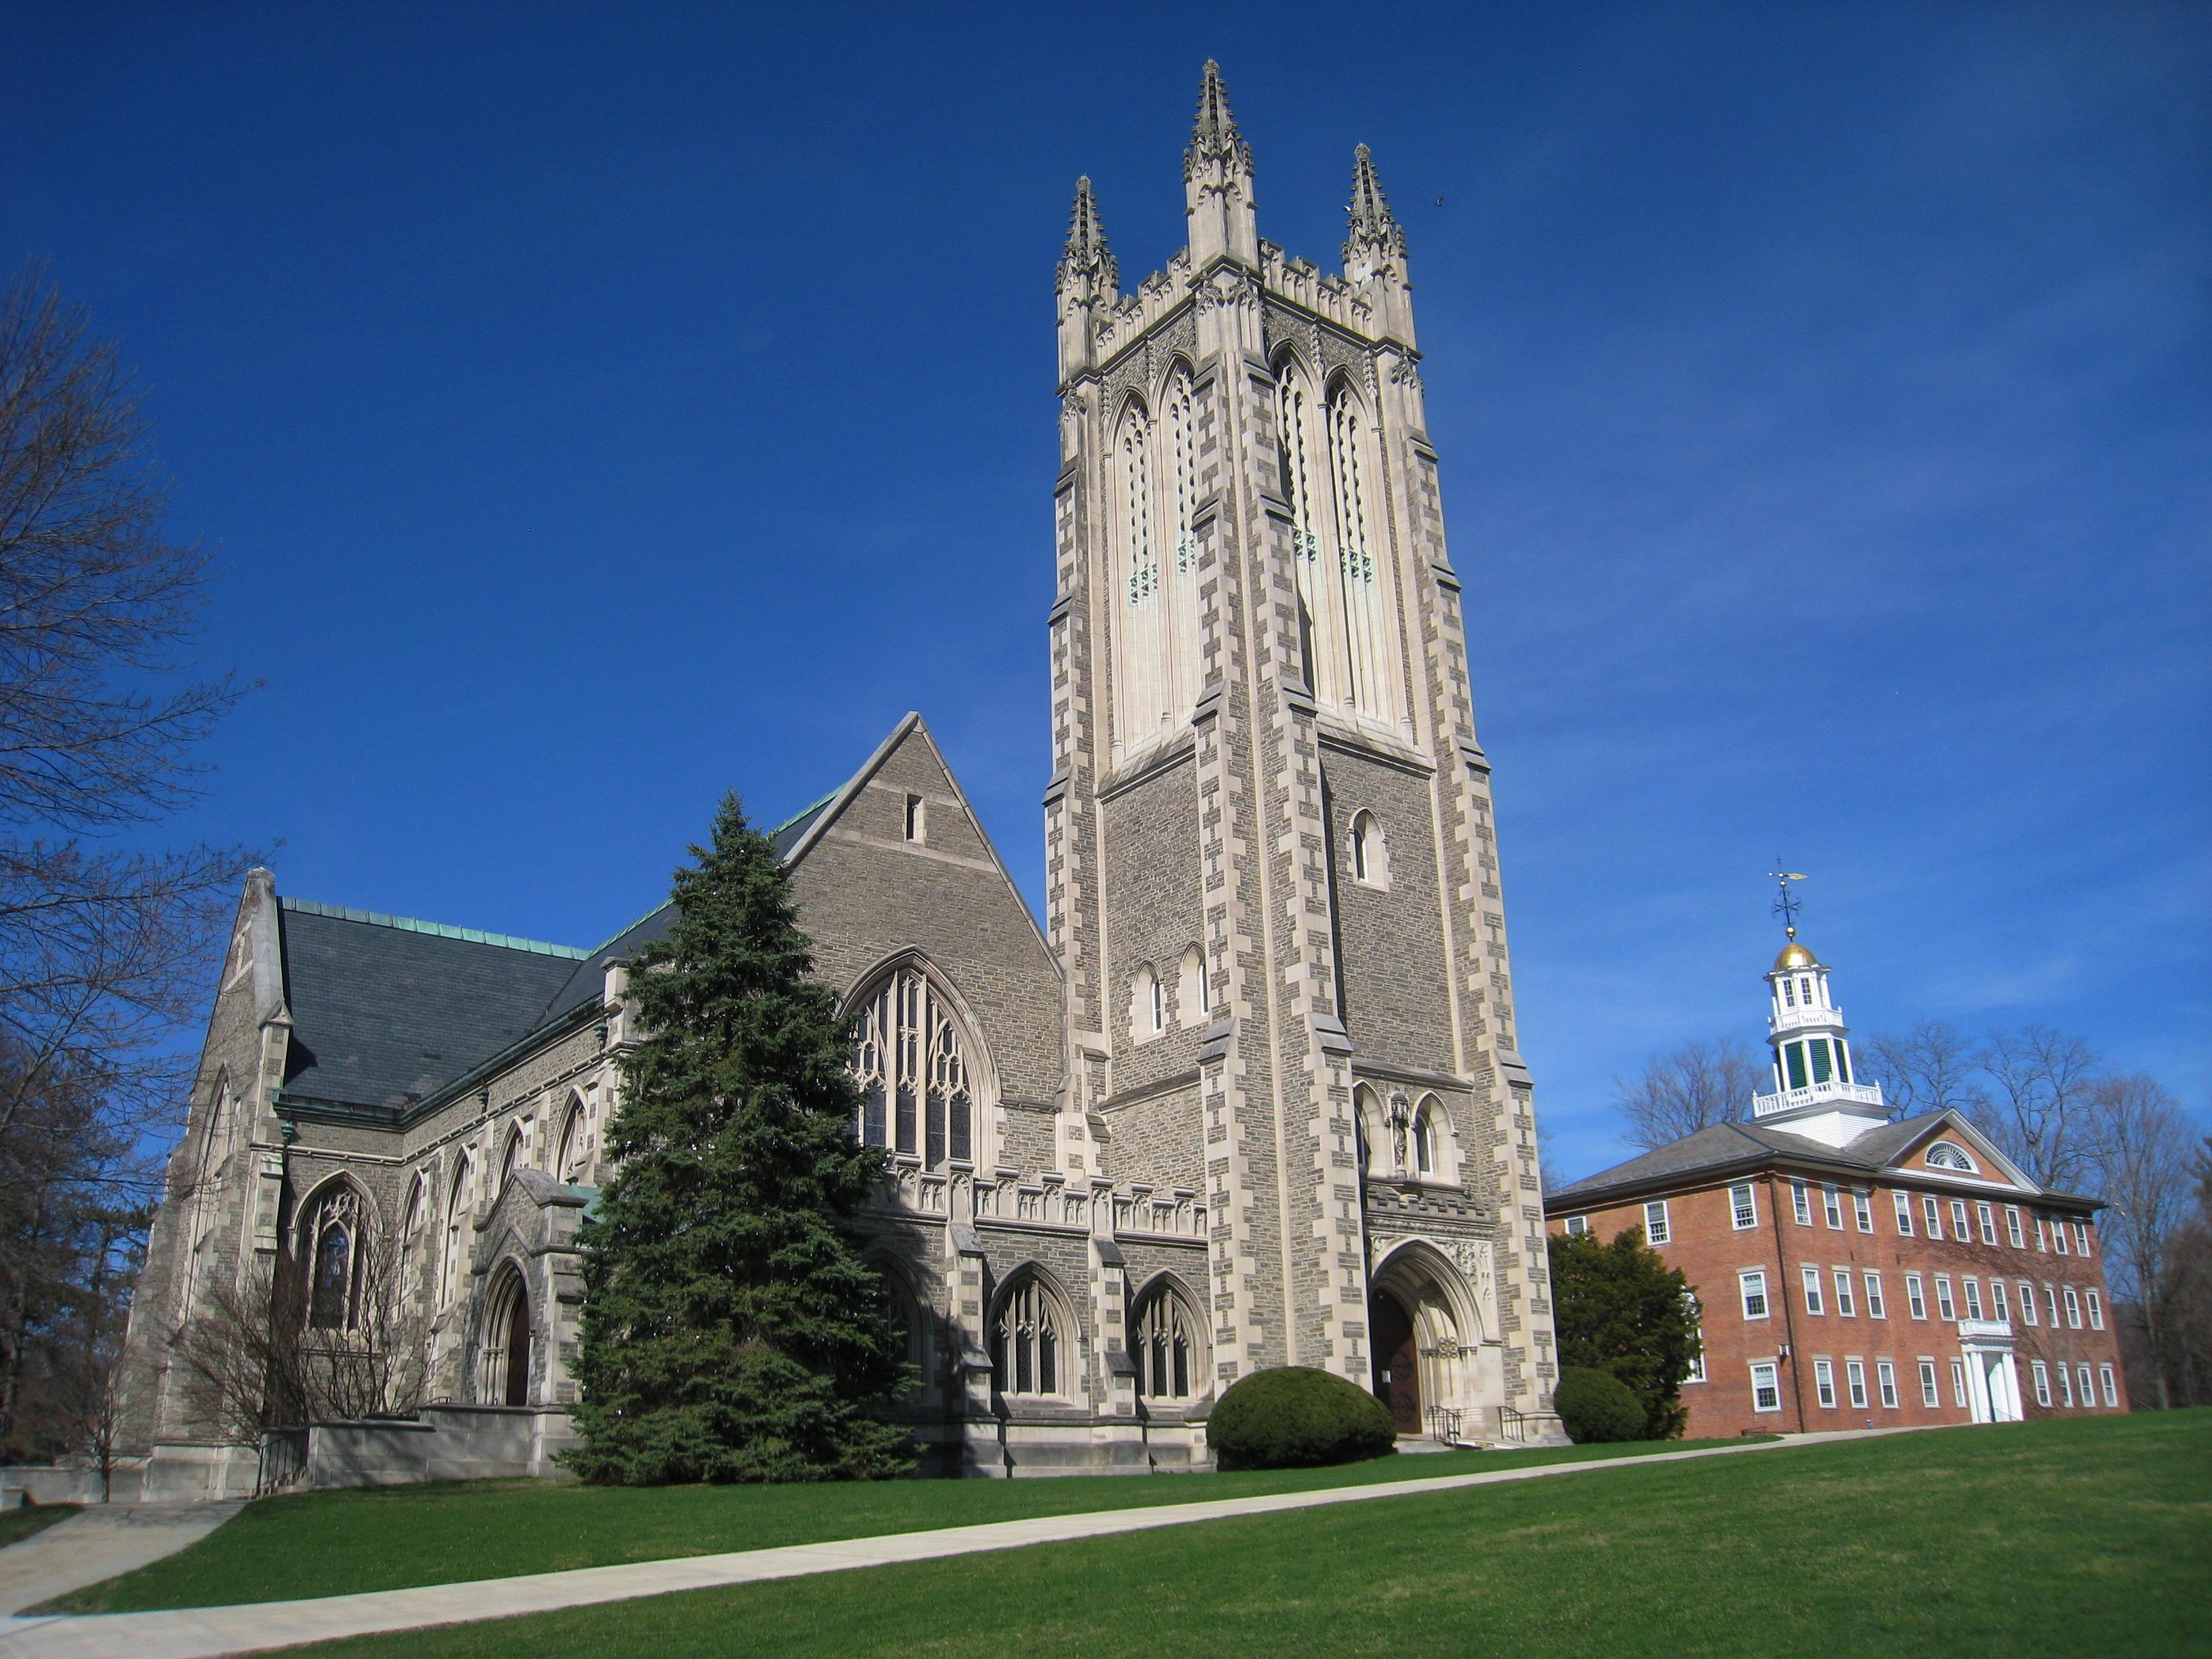 Williams College - Williamstown, Massachusetts